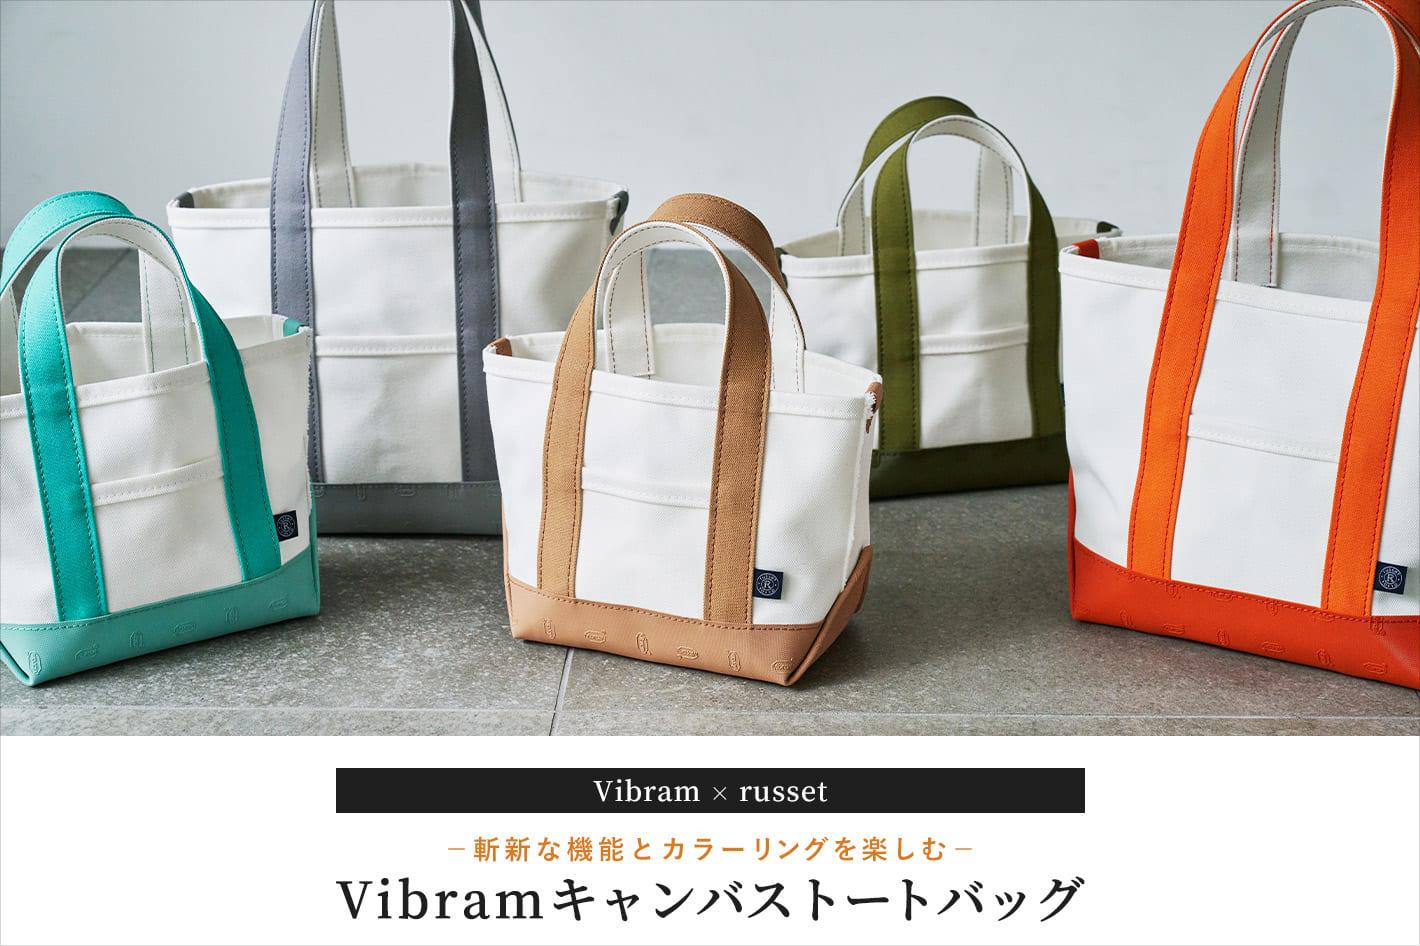 russet ◆Pre Order◆Vibram×russet キャンバストートバッグ